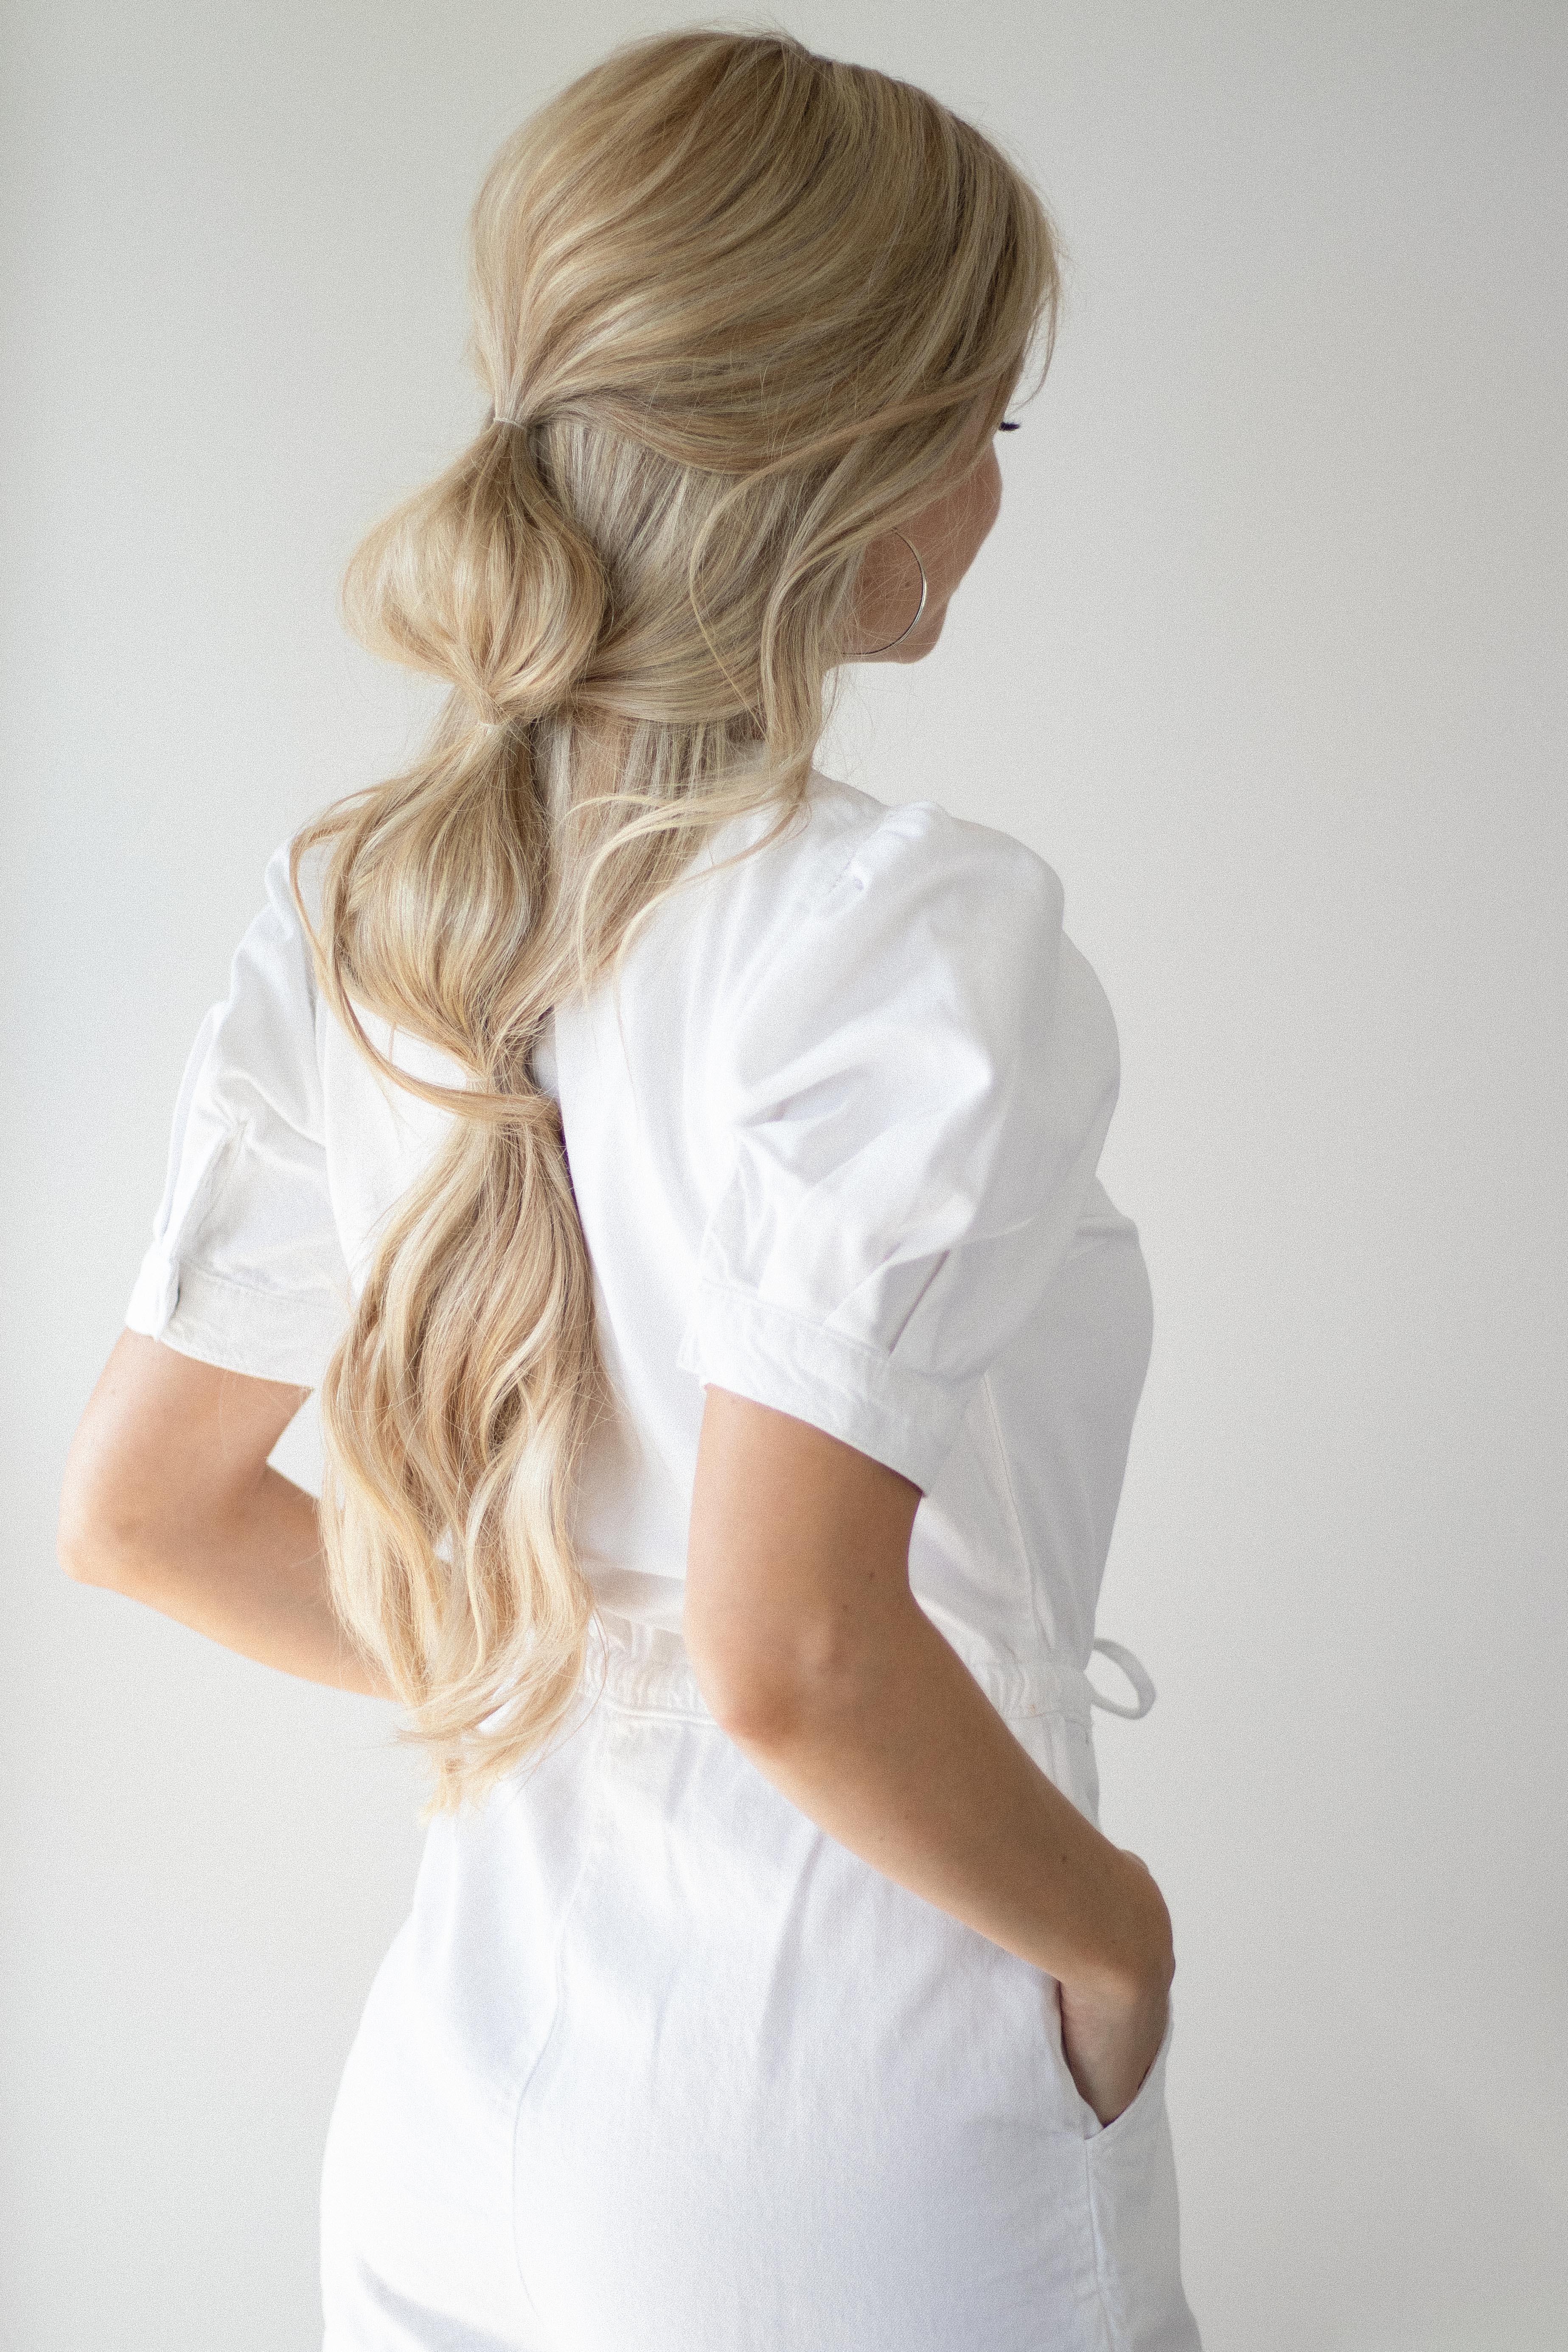 HOW TO EASY BUBBLE HAIR TUTORIAL | www.alexgaboury.com